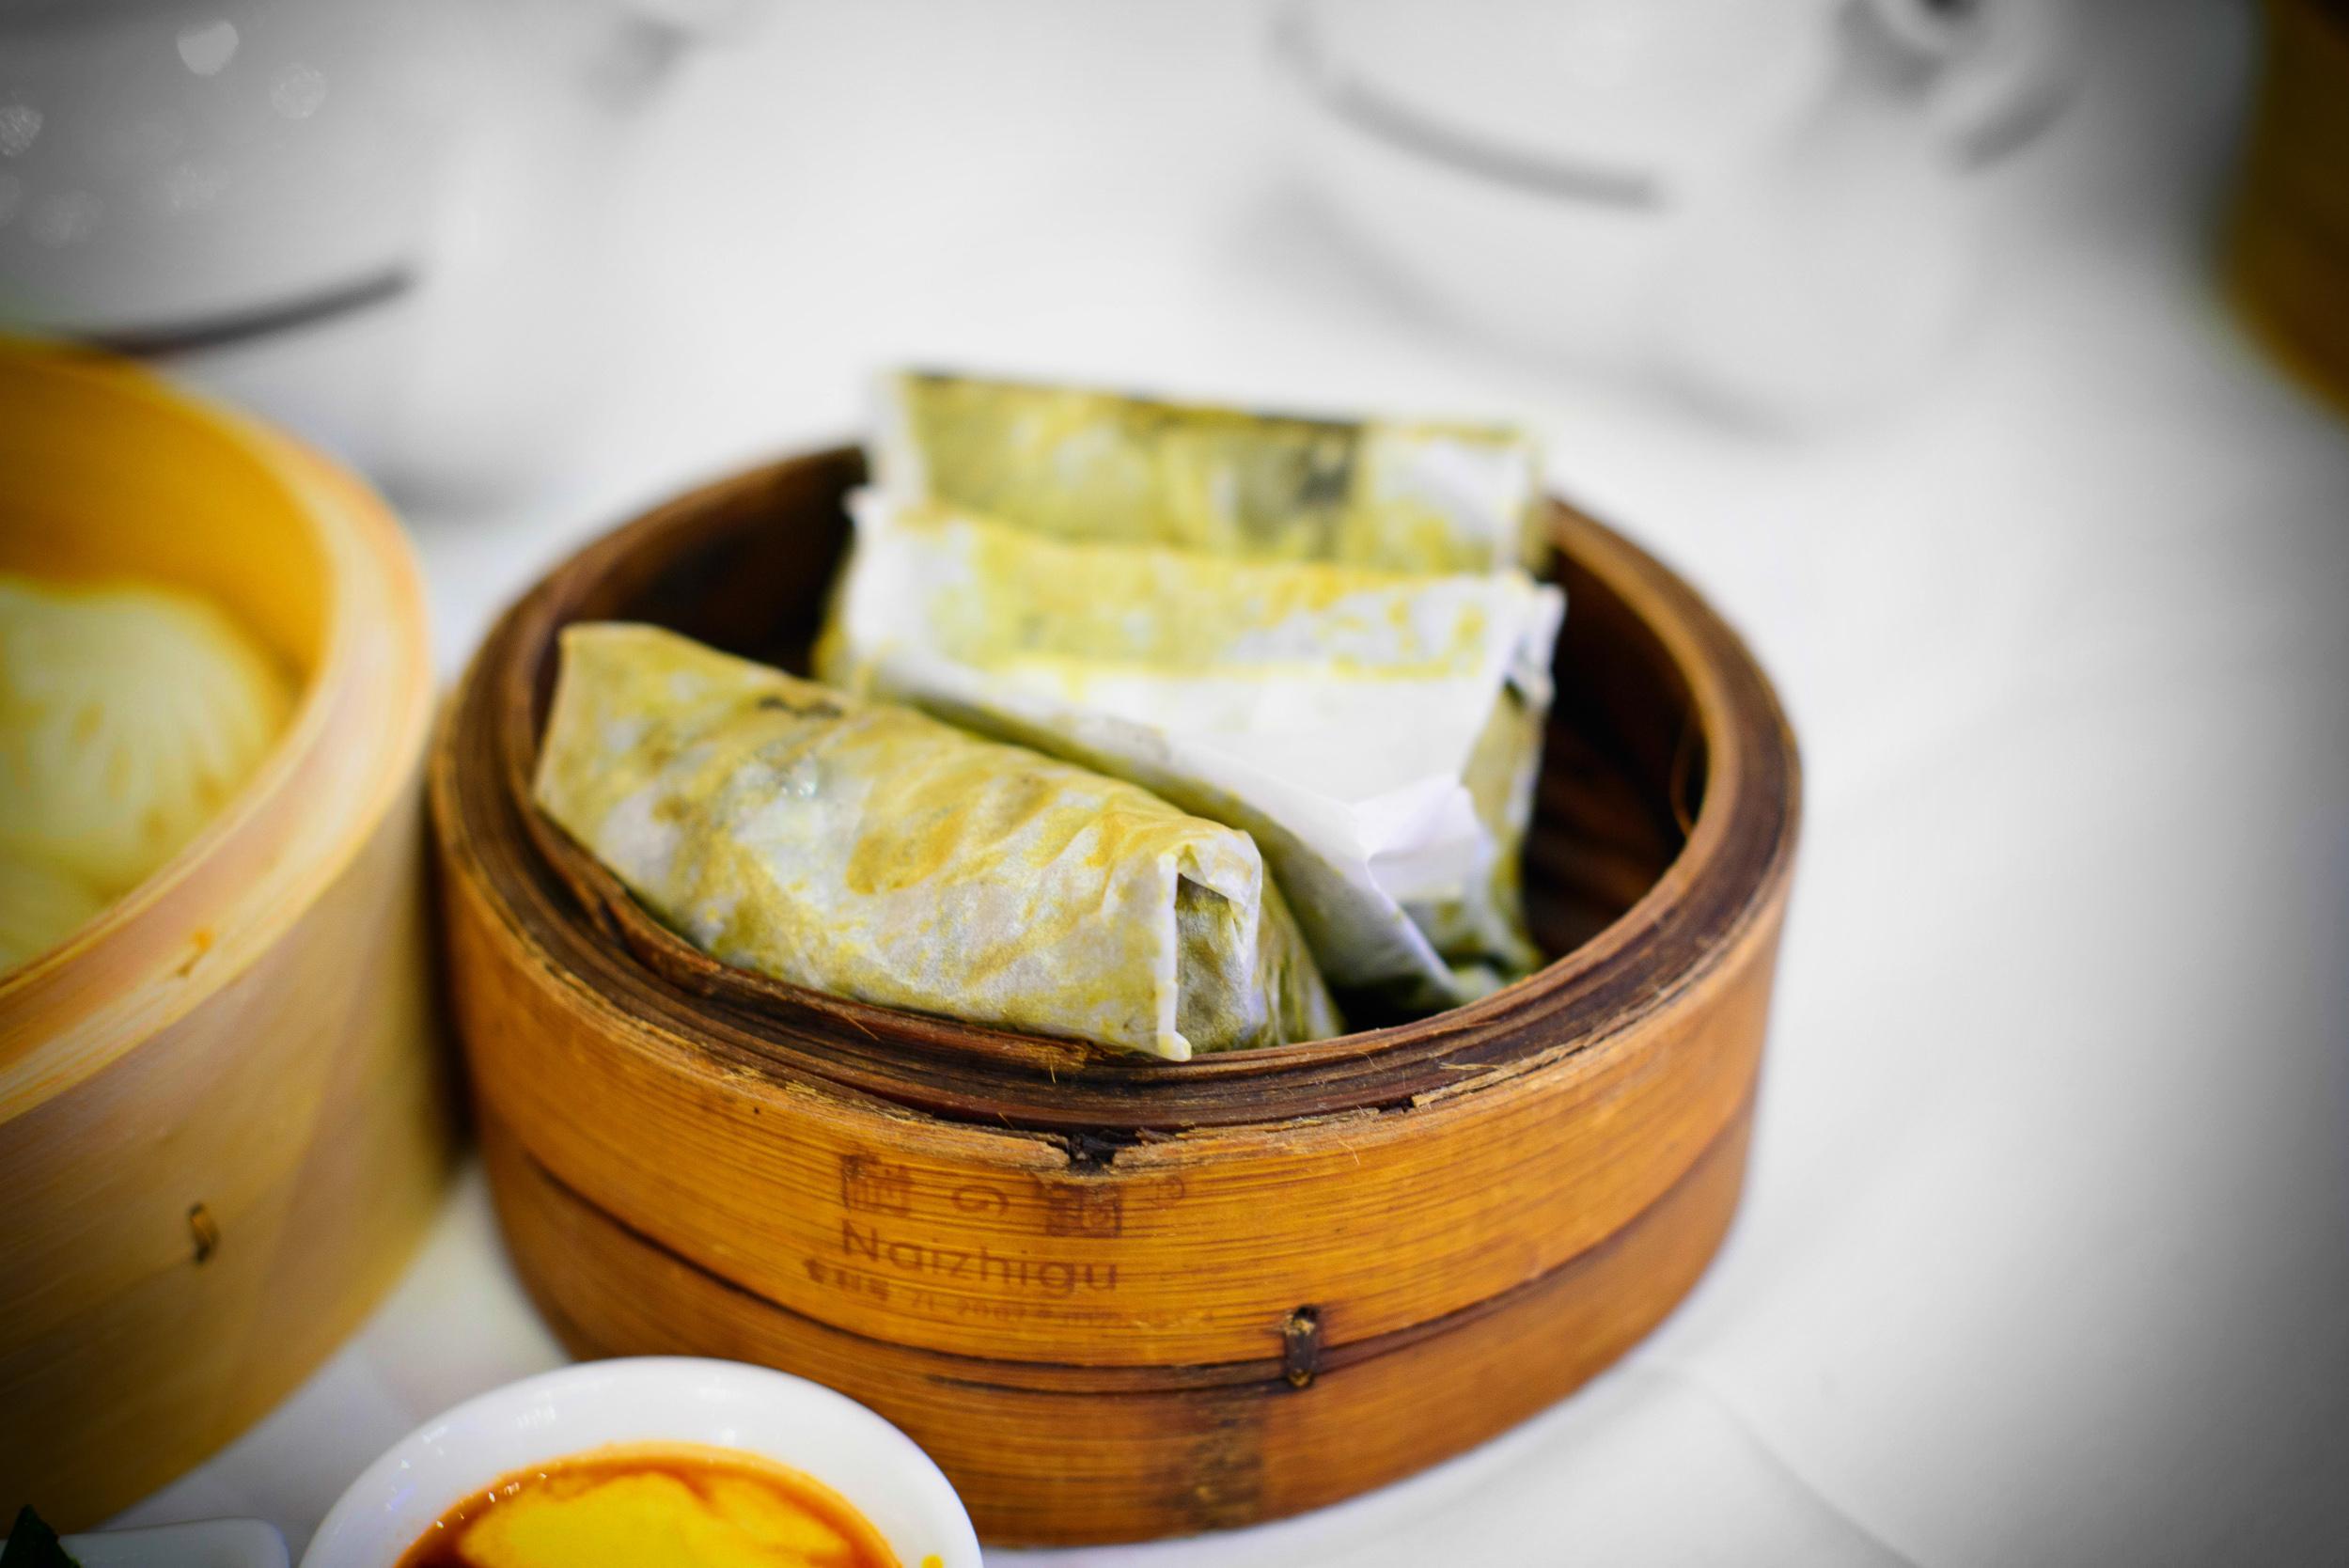 Taro leaf, sticky rice, dried shrimp